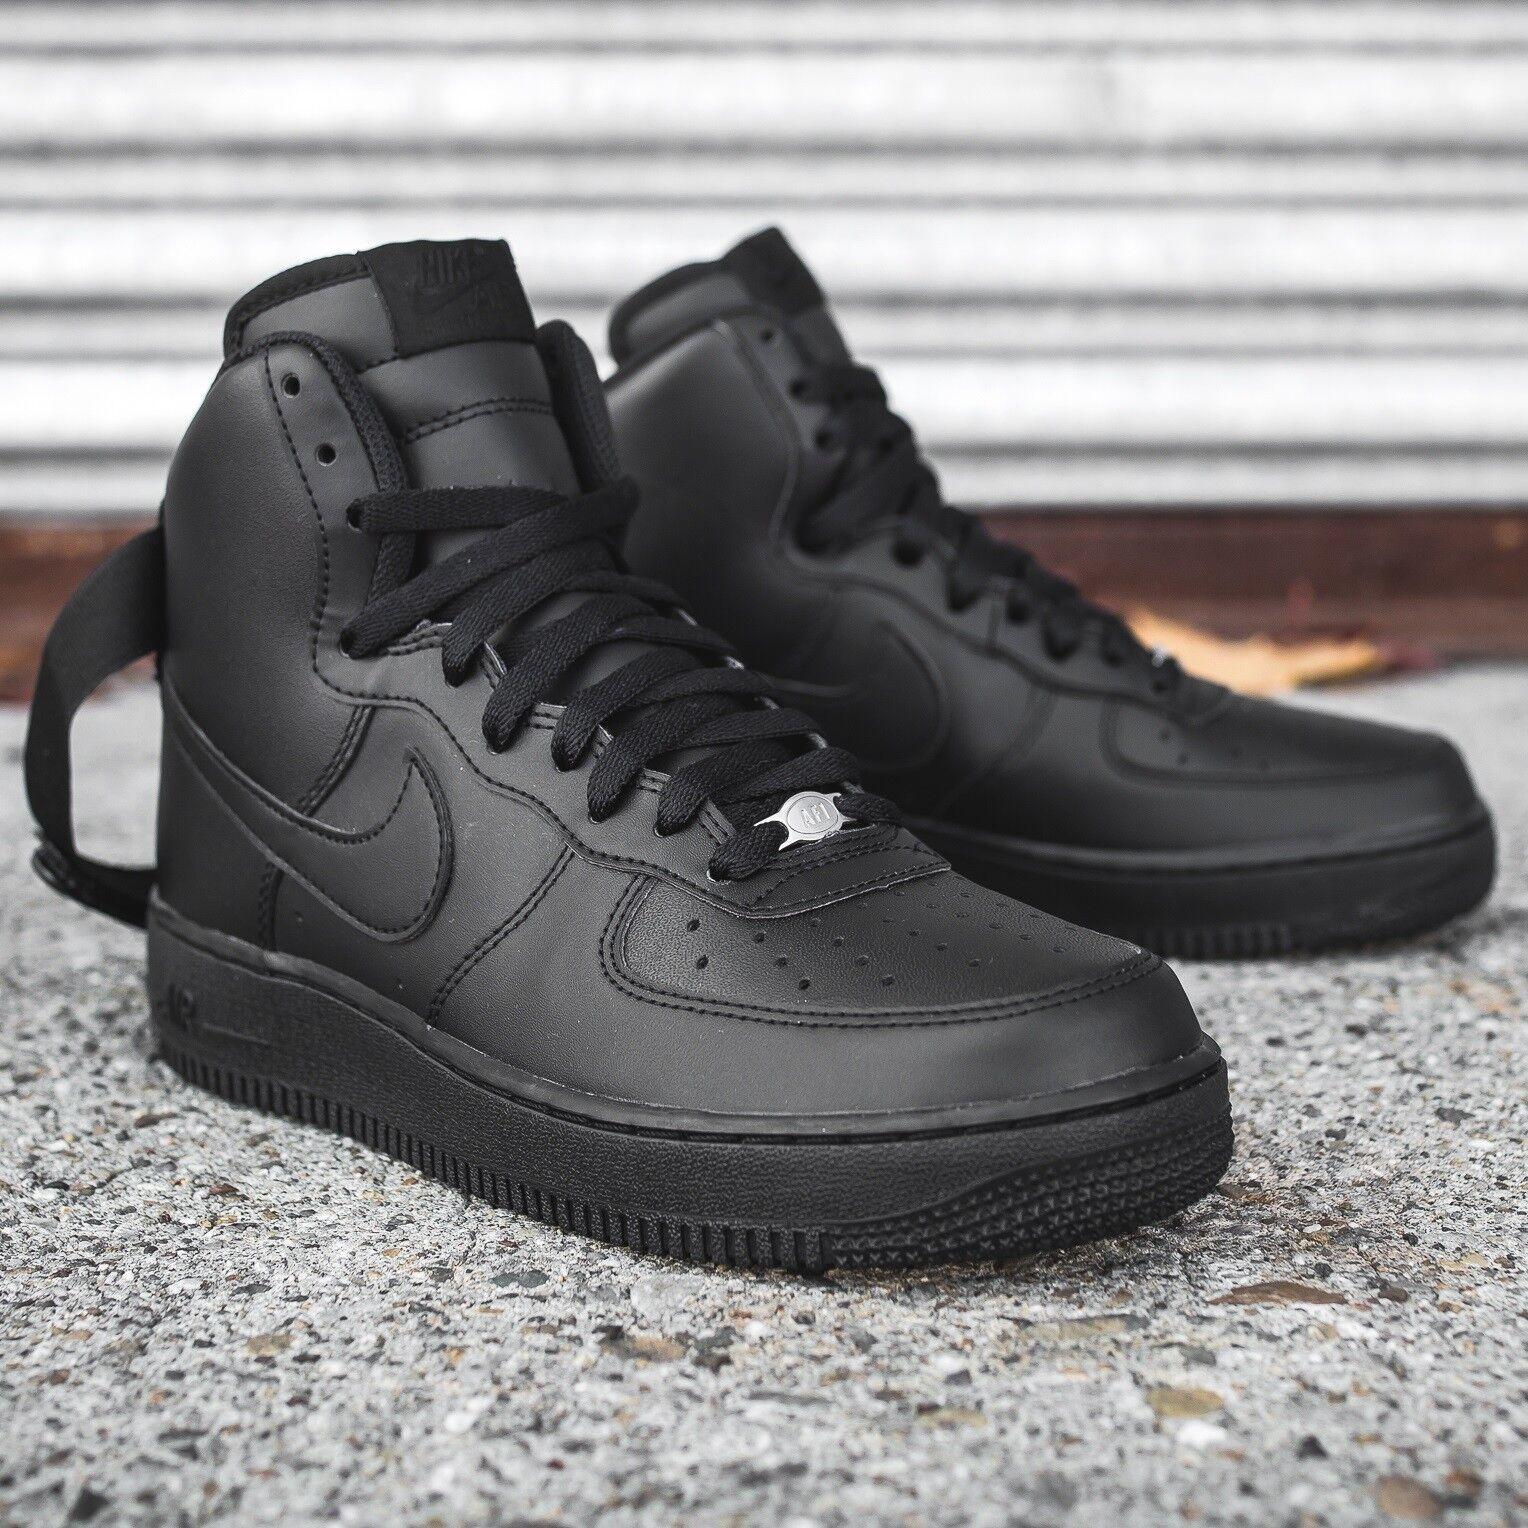 Nike air force 1 hoch hoch hoch  mitte schuhe - lifestyle - bequeme Turnschuhe c9a006